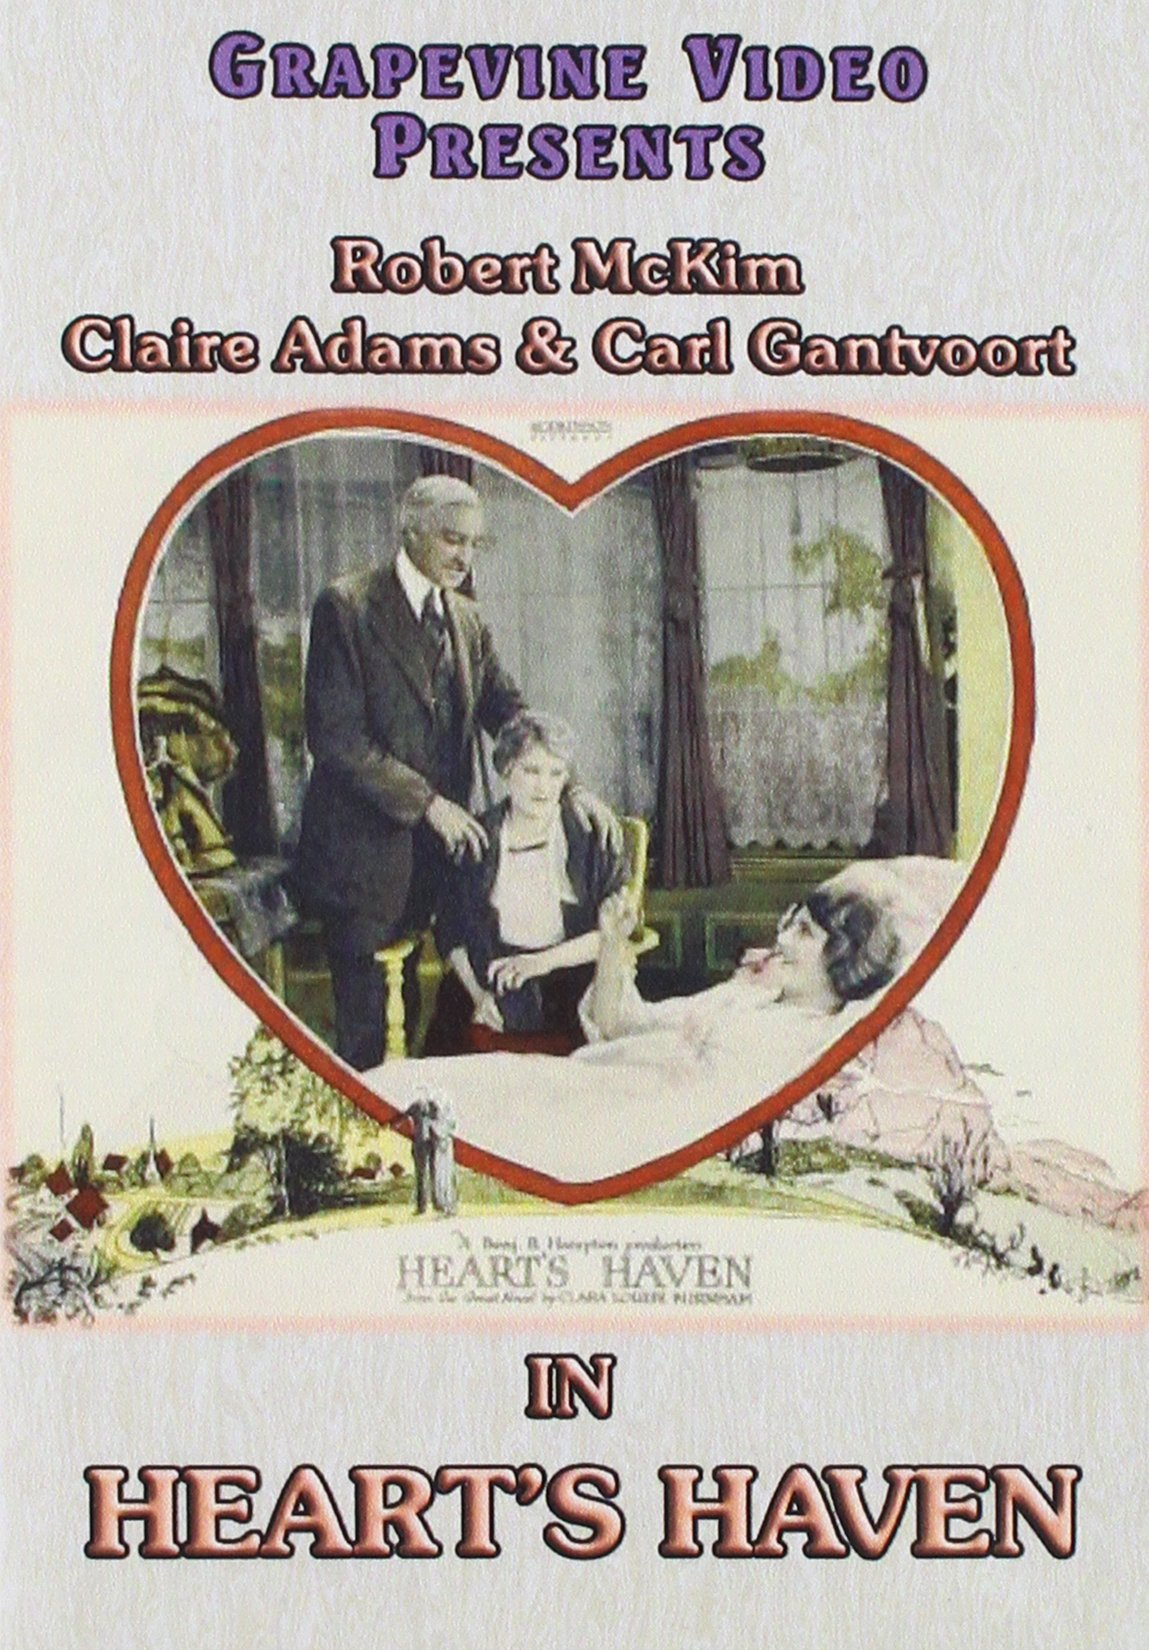 DVD : Hearts Haven (Black & White, Silent Movie)